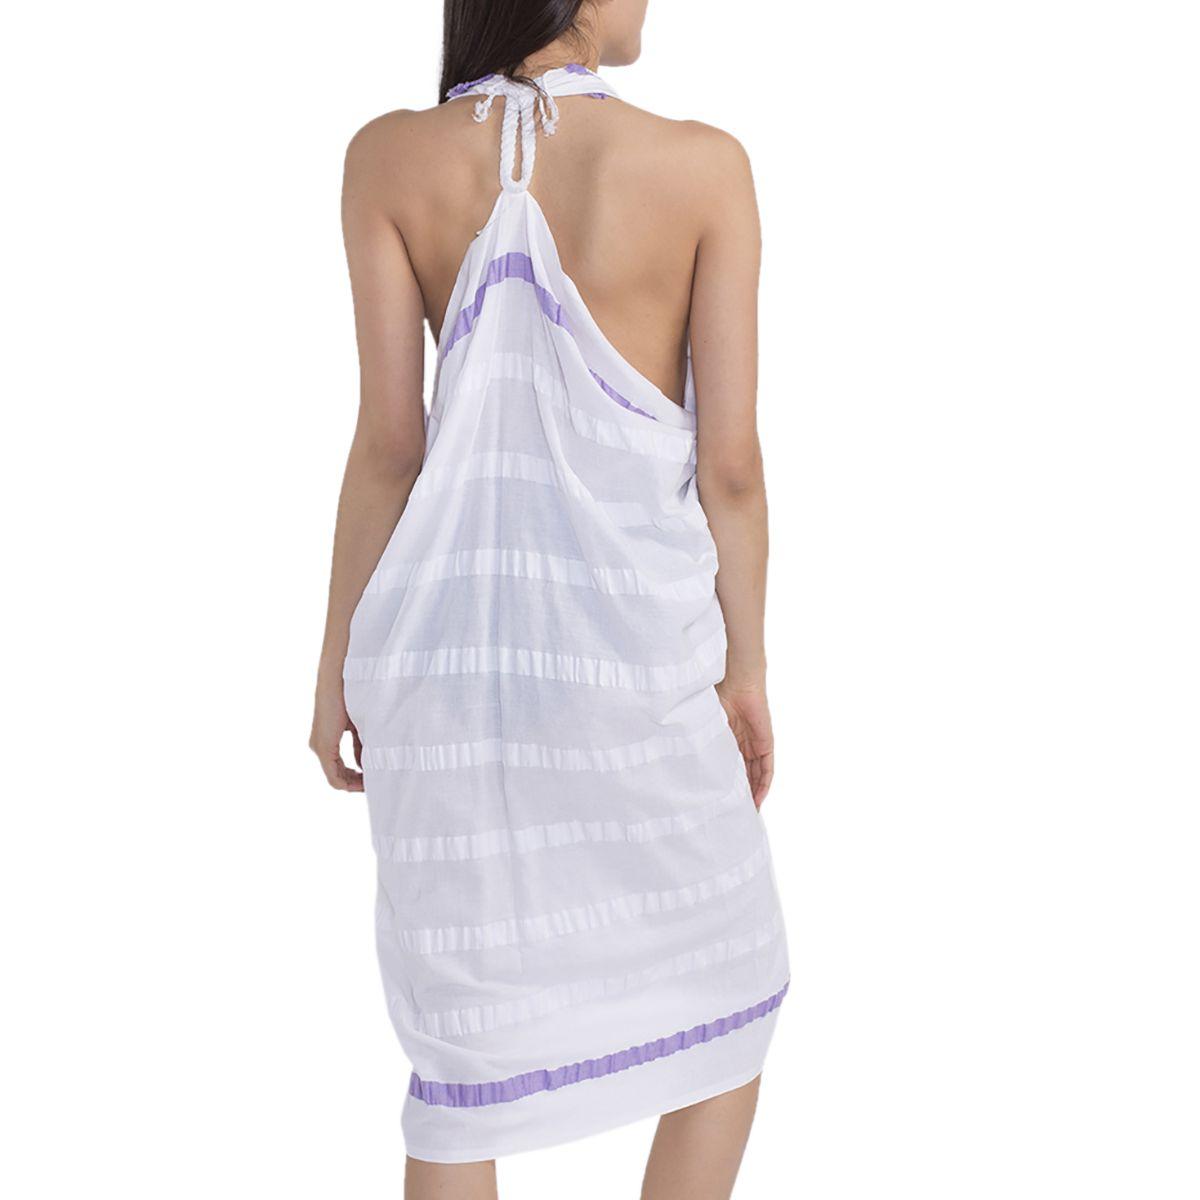 Pareo - Acacia / Dark Lilac Stripes